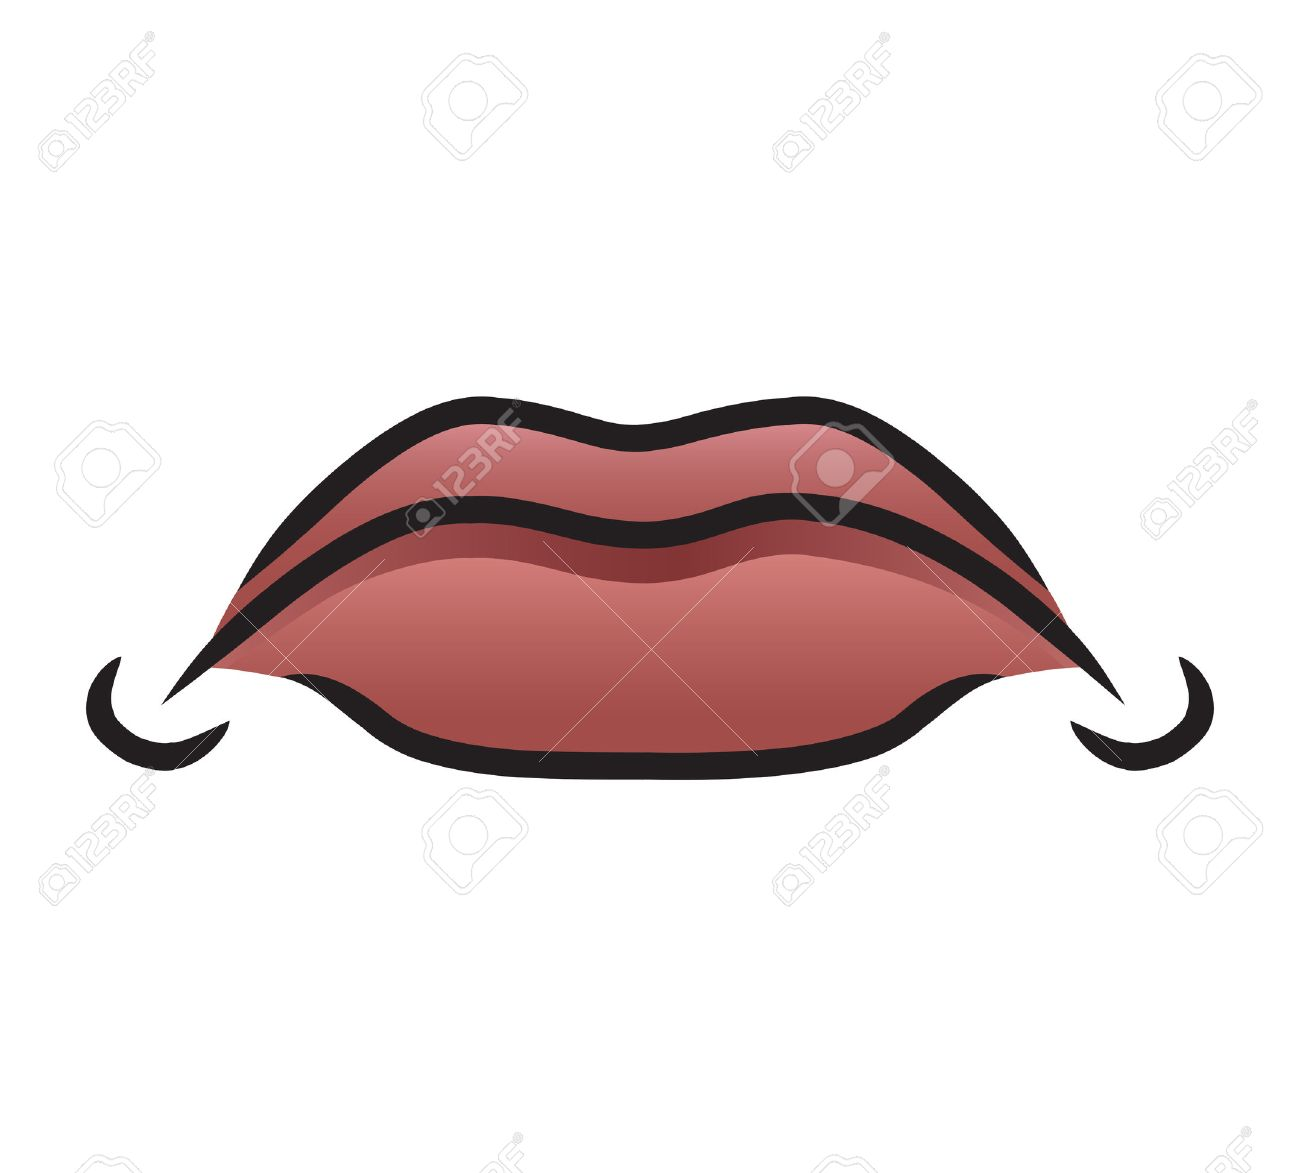 Рот для всех онлайн 24 фотография